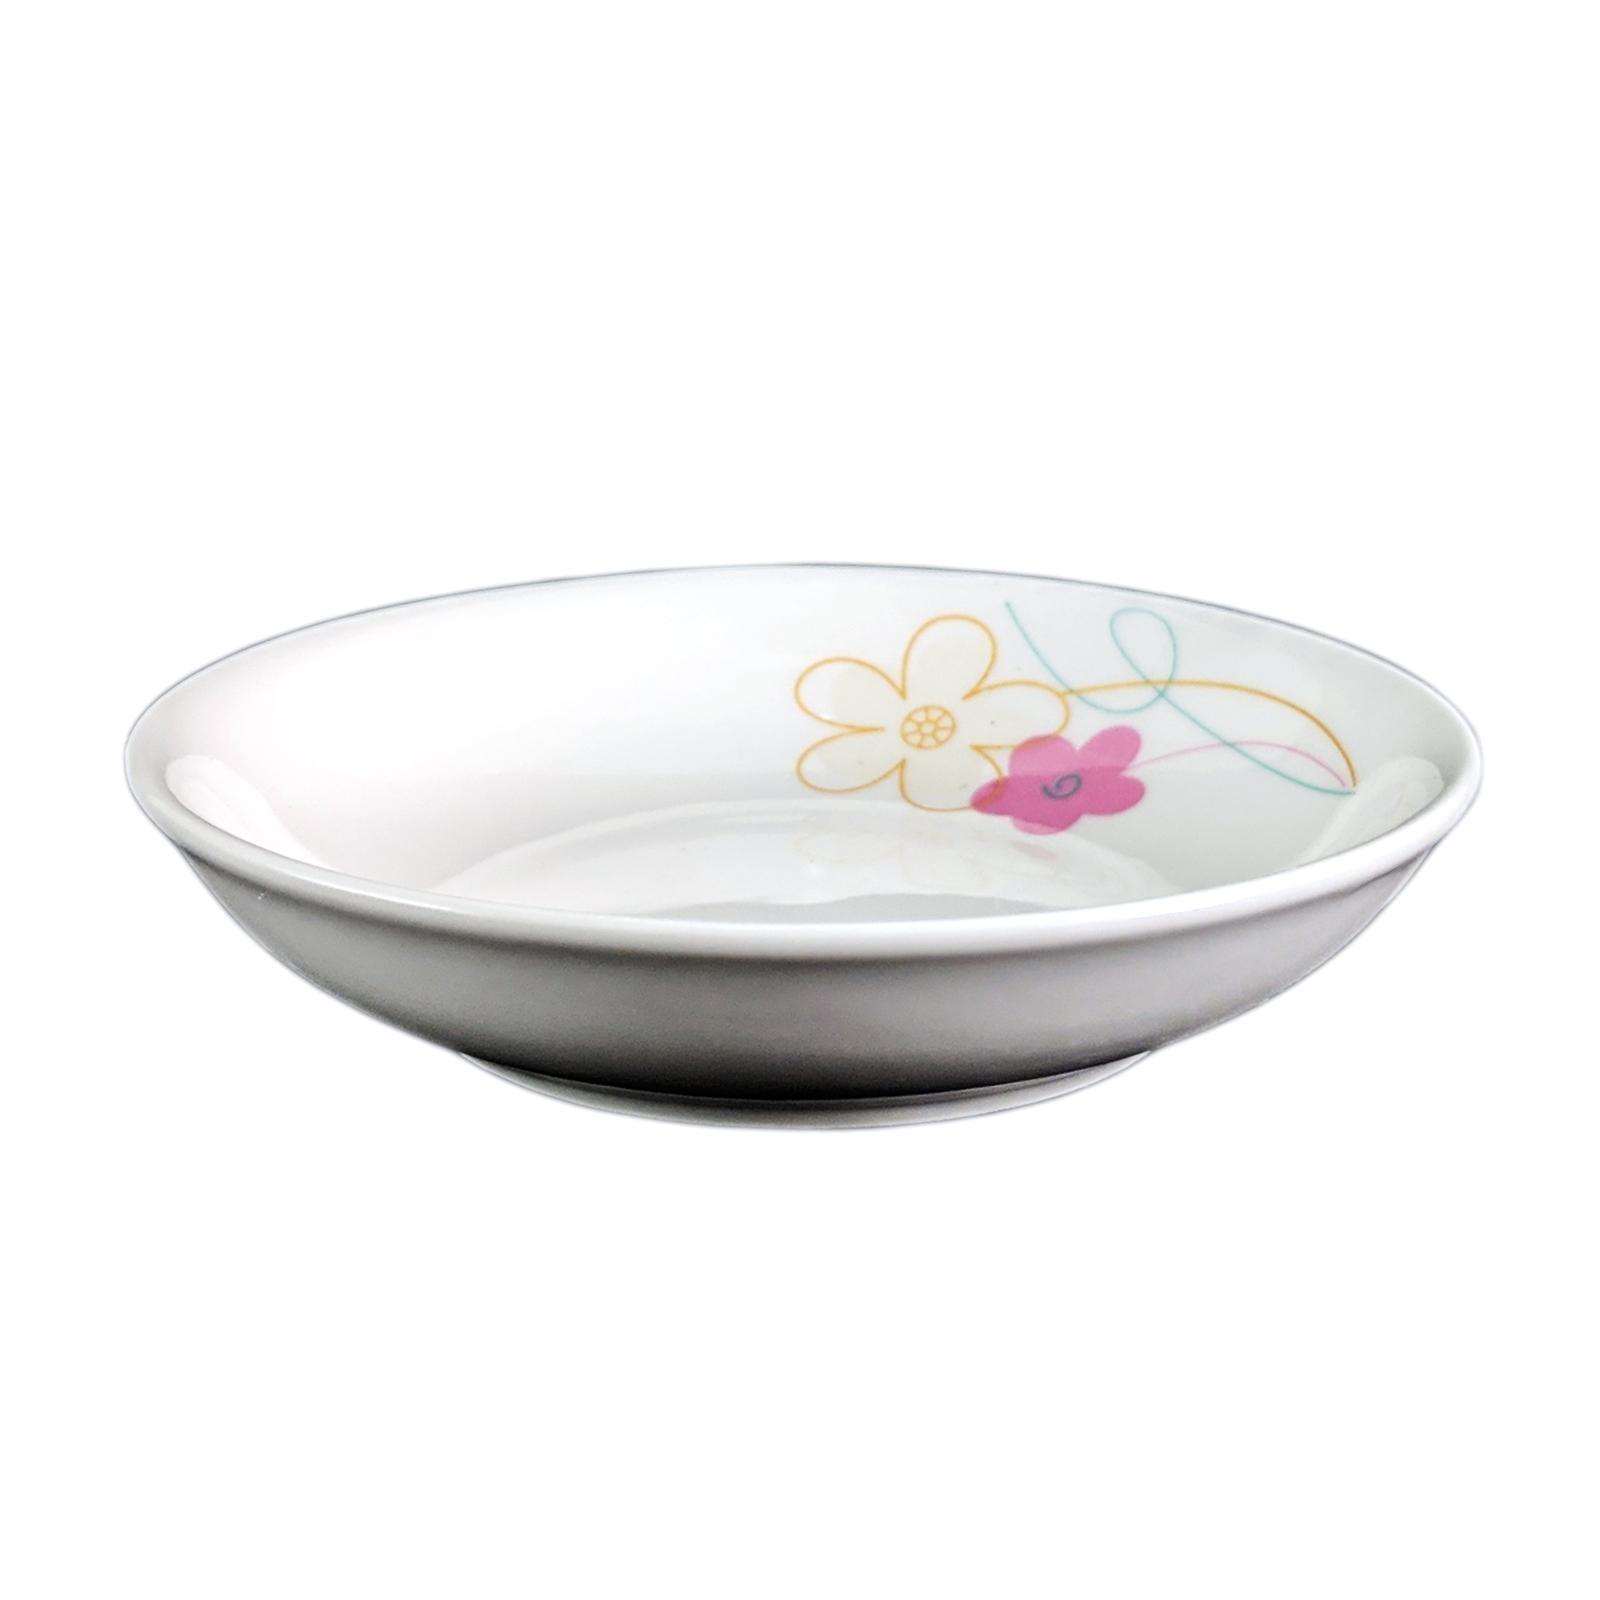 Amark Plum Blossom Porcelain Sauce Dish 4